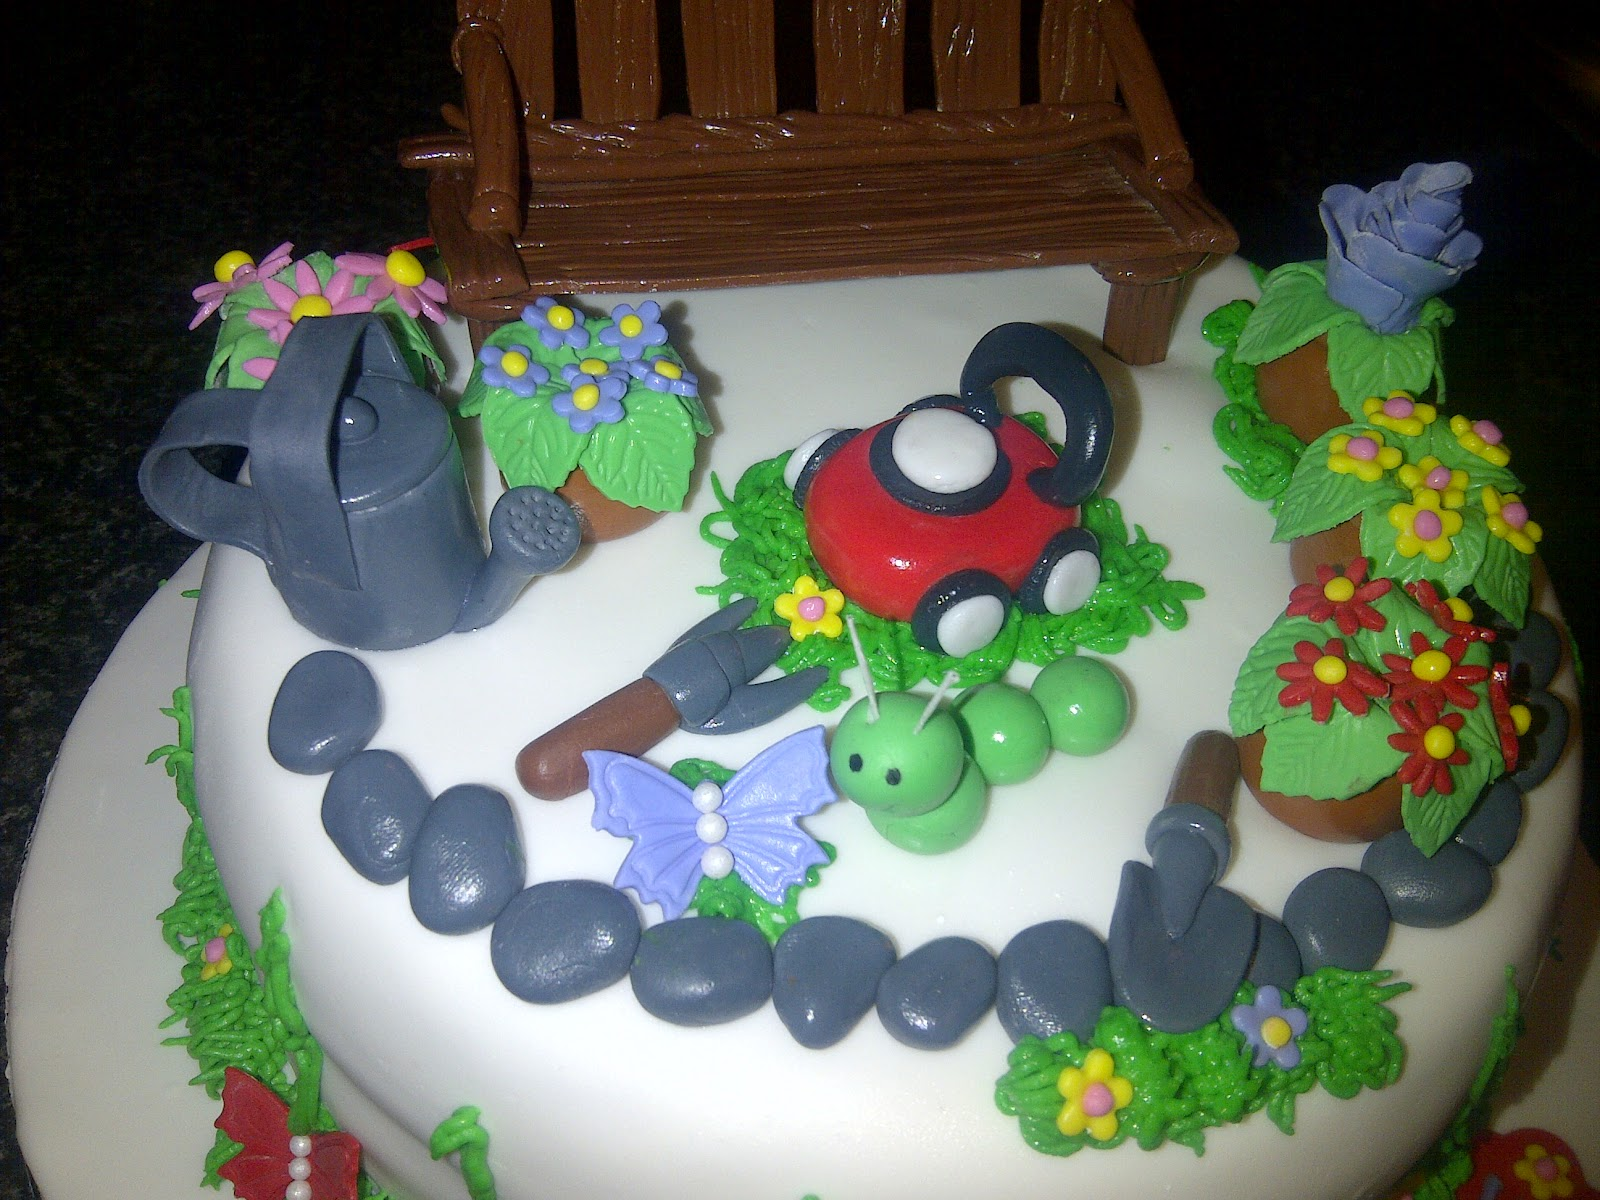 Die Koekblik Gardening Birthday Cake 2 March 2012